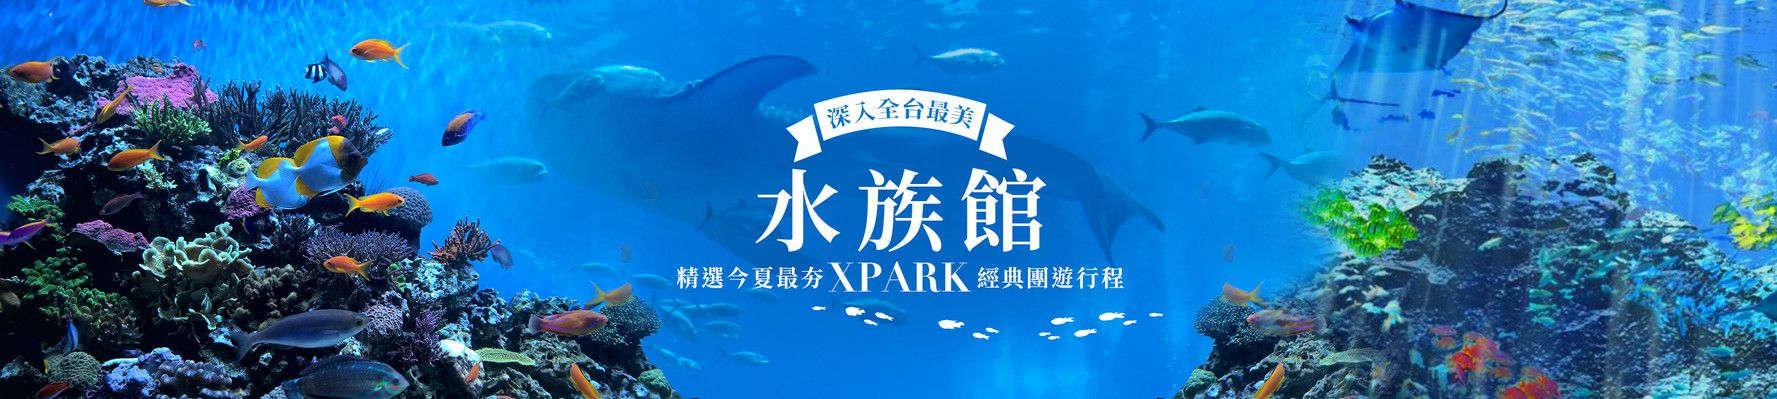 XPARK.開箱全台最美水族館